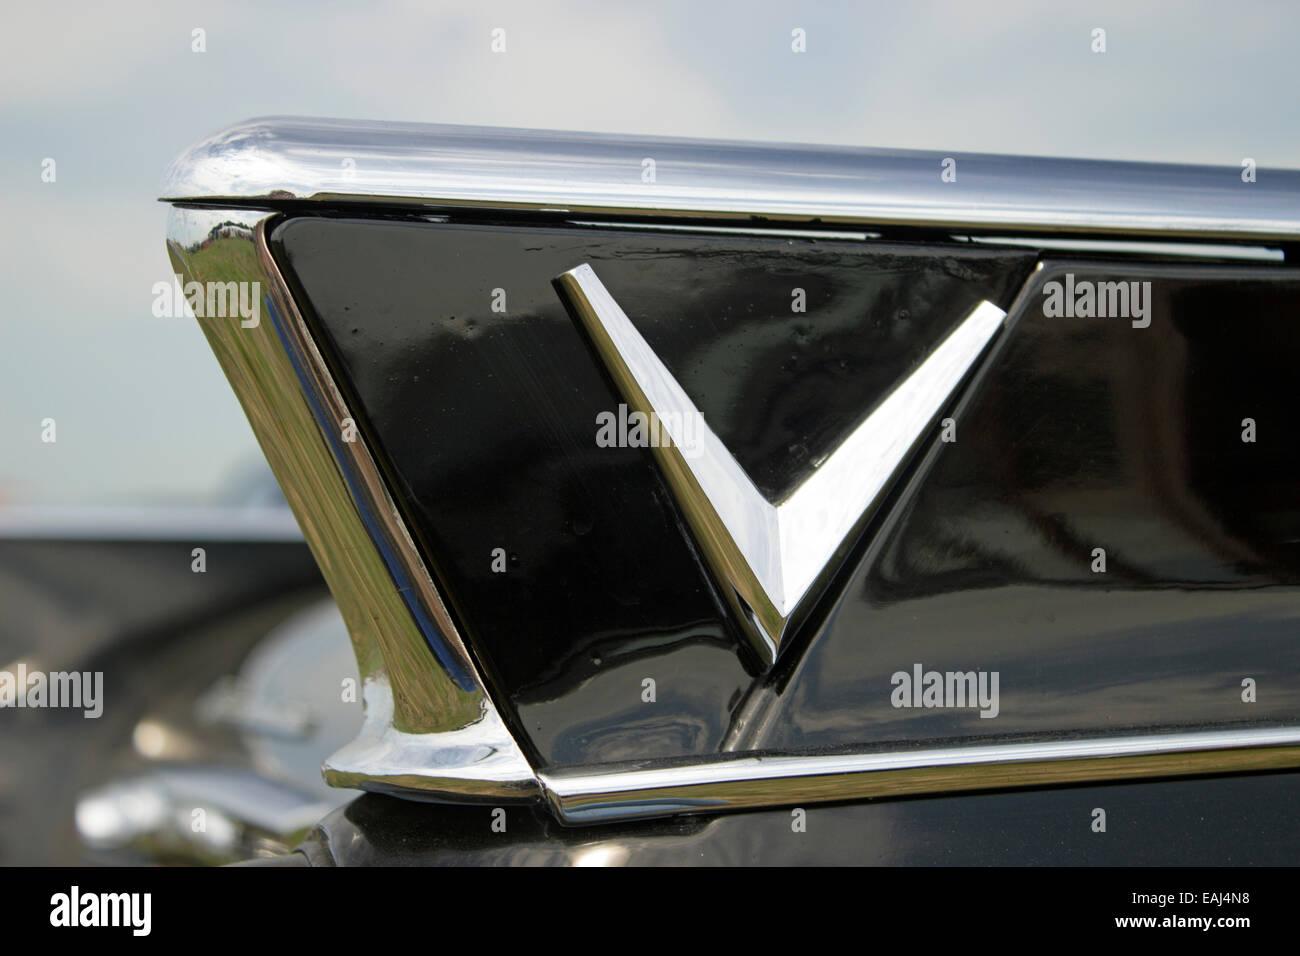 Vauxhall Cresta Rear Wing - Stock Image